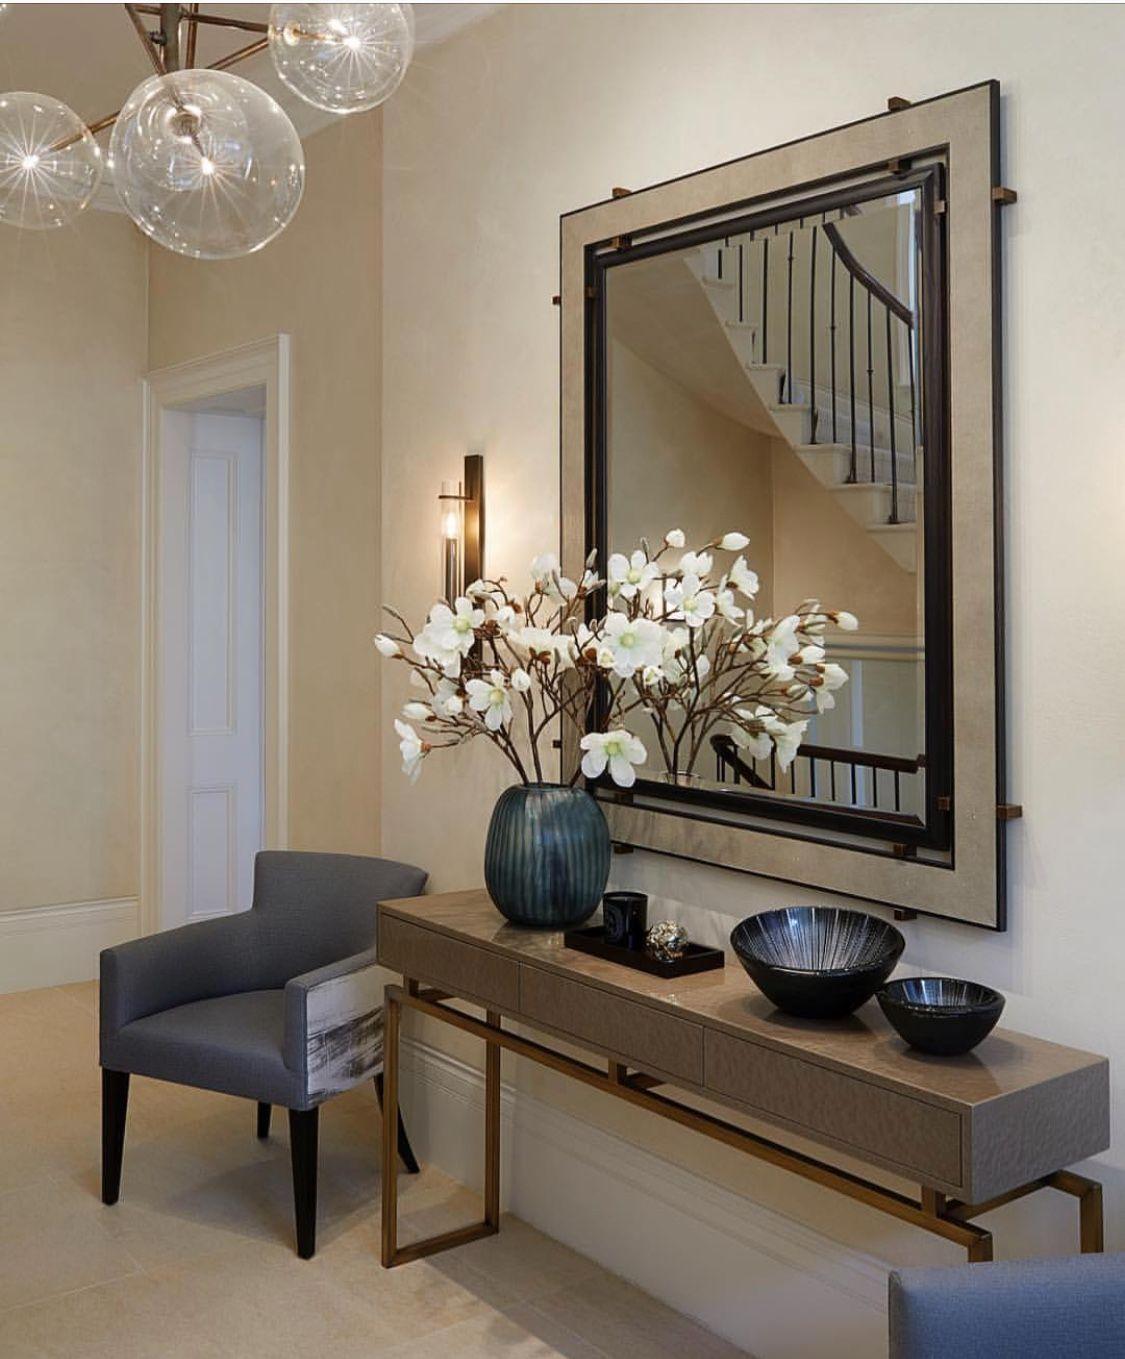 Entry hallway lighting  Pin by Halise Devrim on Home Interiors  Pinterest  Entrance halls